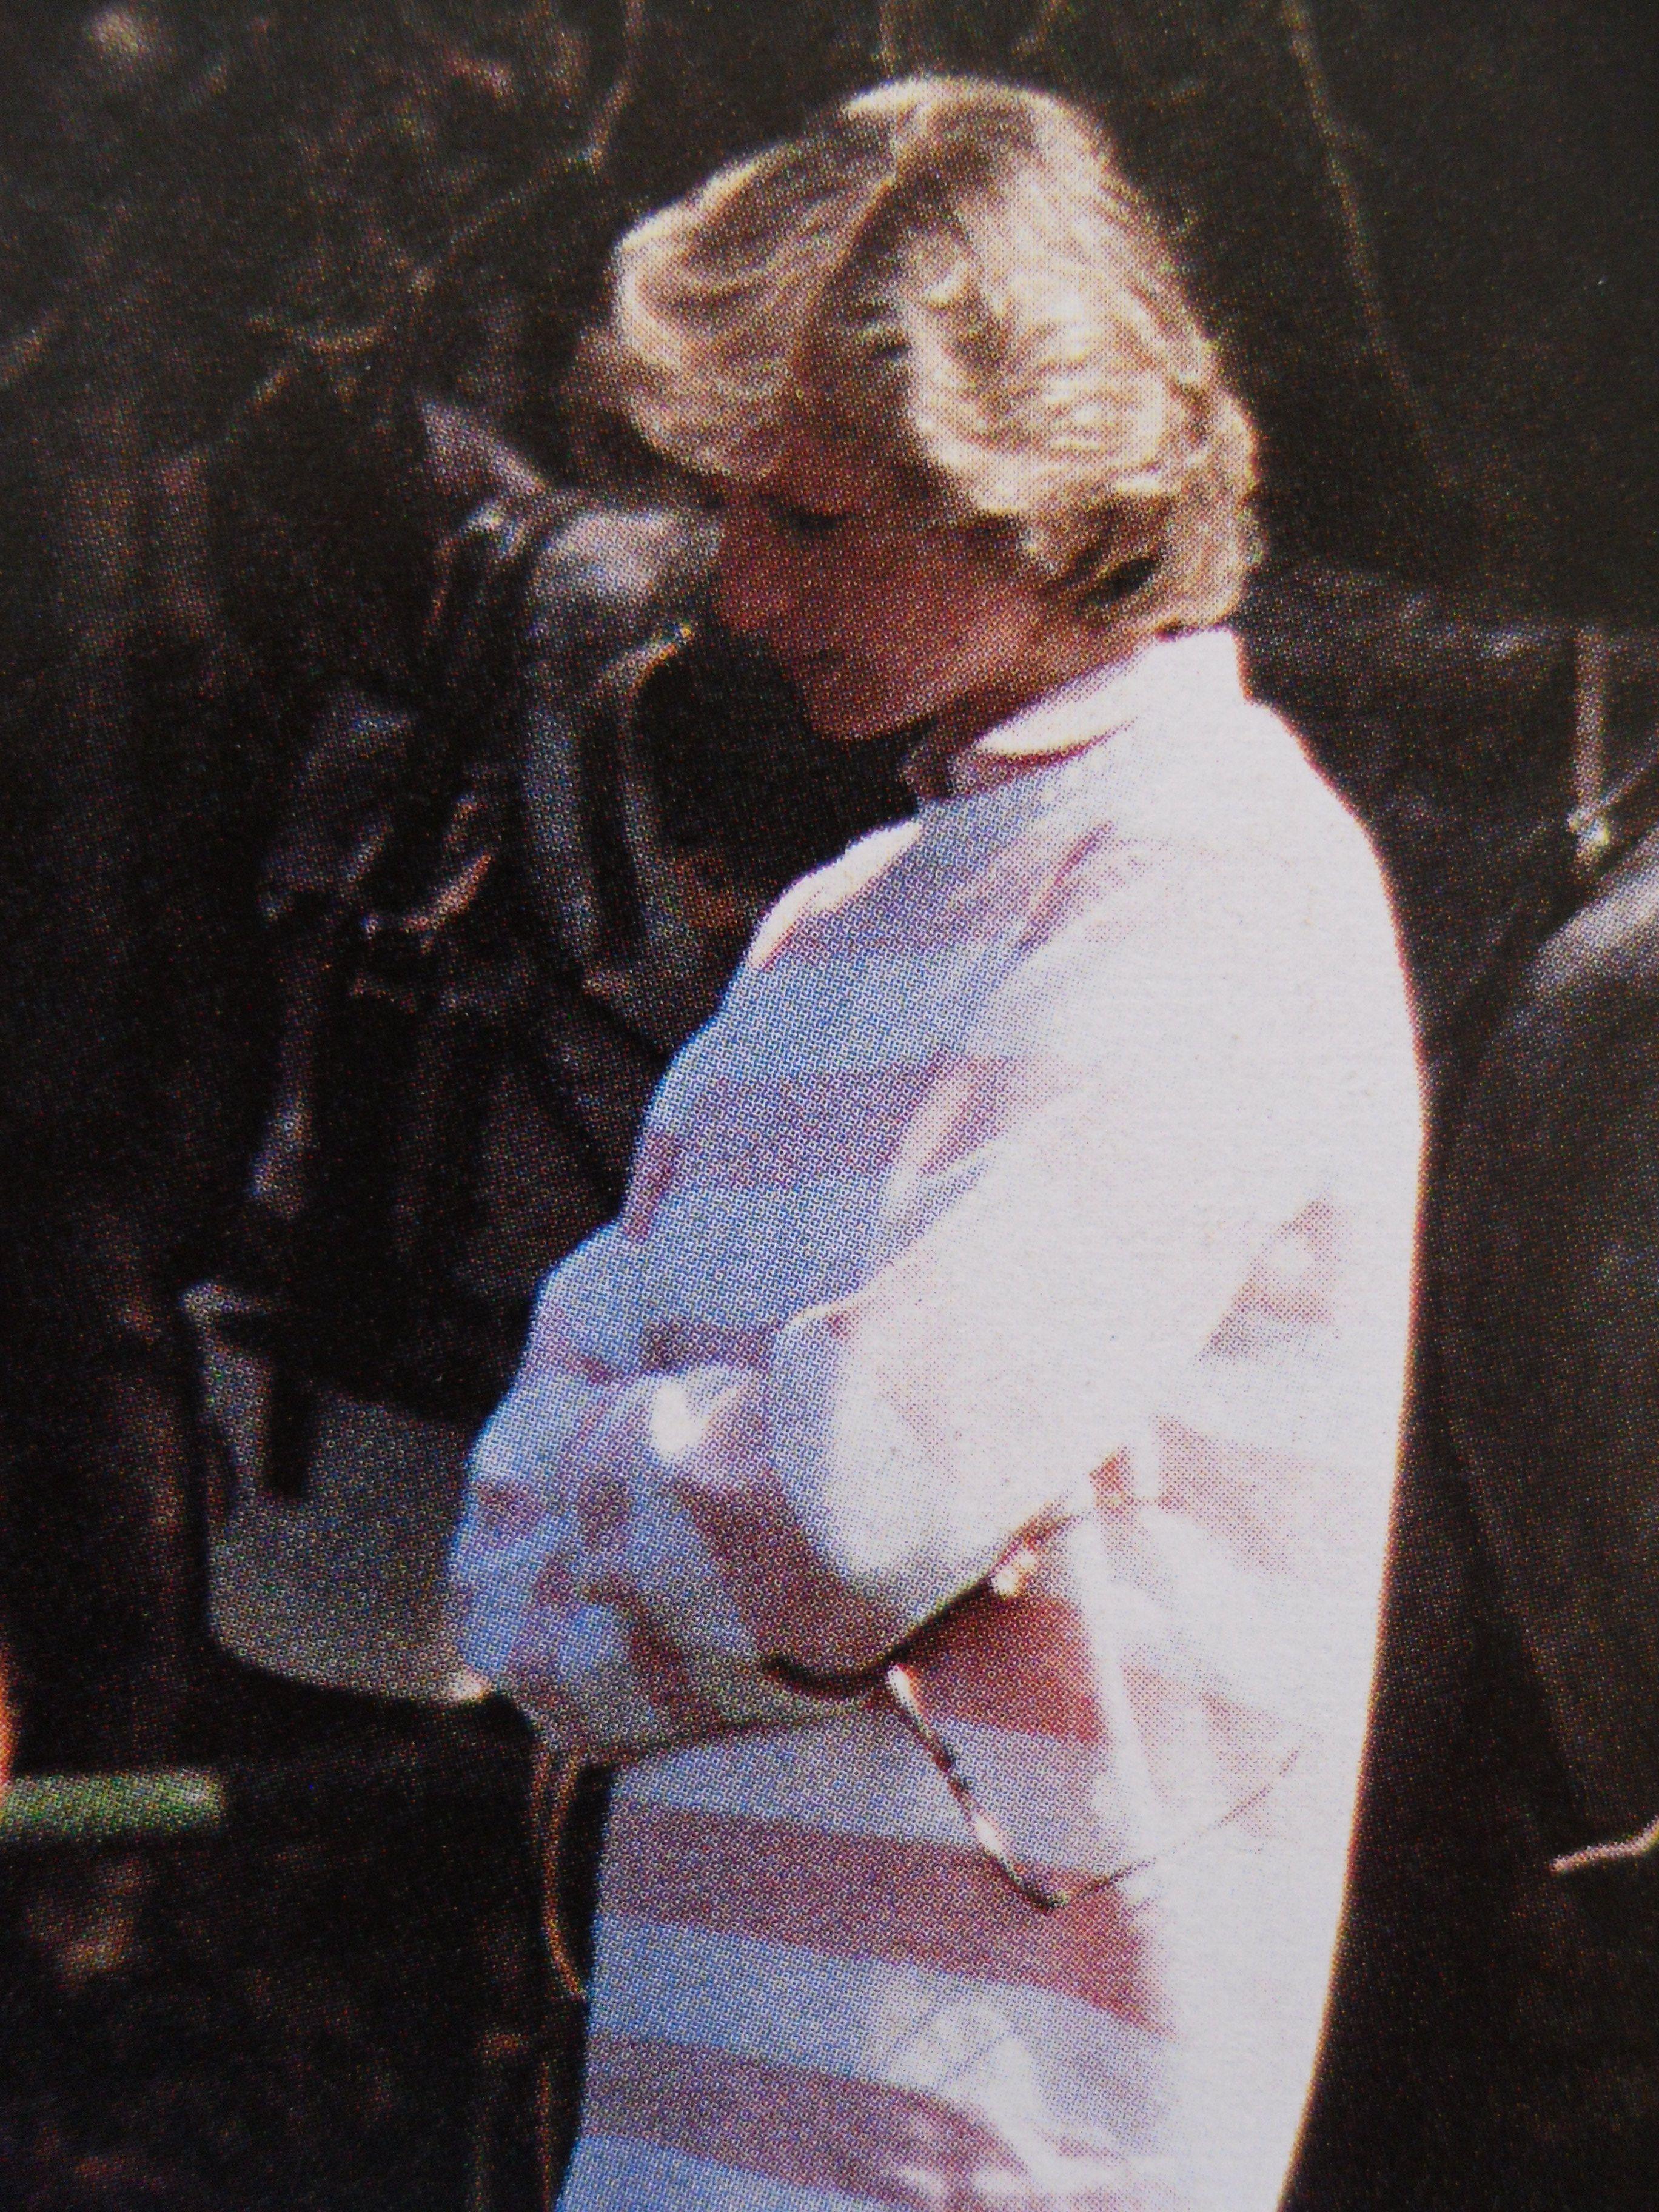 April 29, 1984: Princess Diana watches Prince Charles play polo at Windsor.